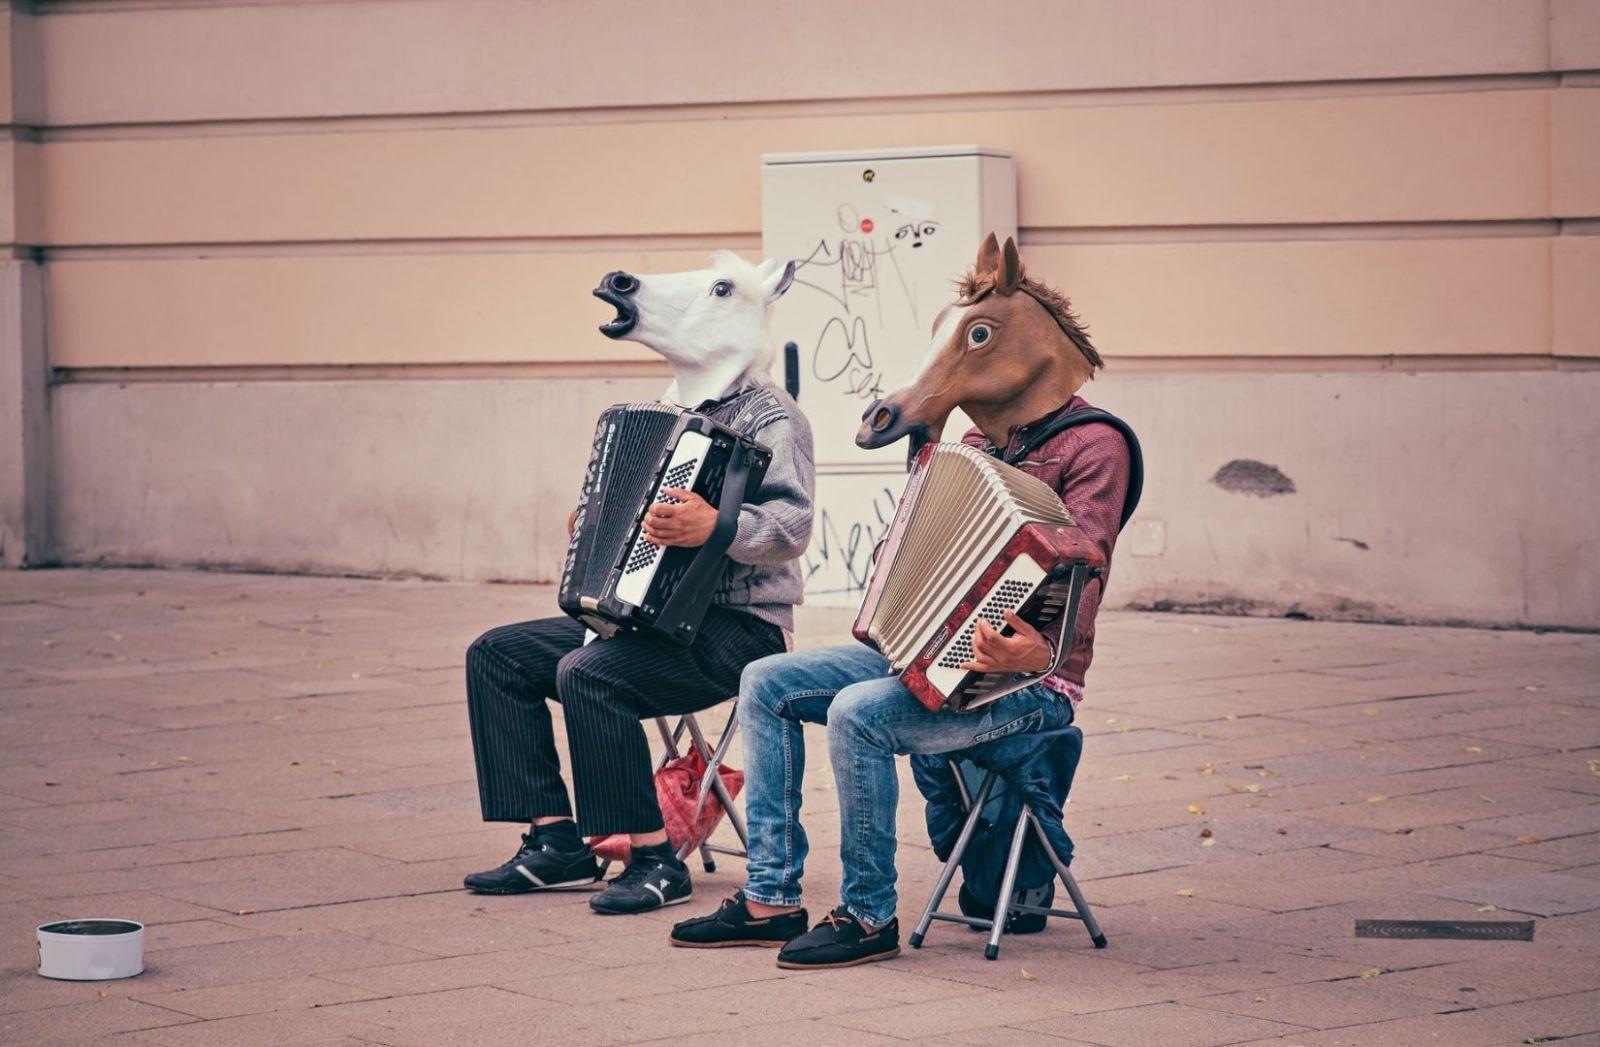 Straßenmusiker in Wien Österreich. (Foto: Dominik Vanyi, Unsplash.com)